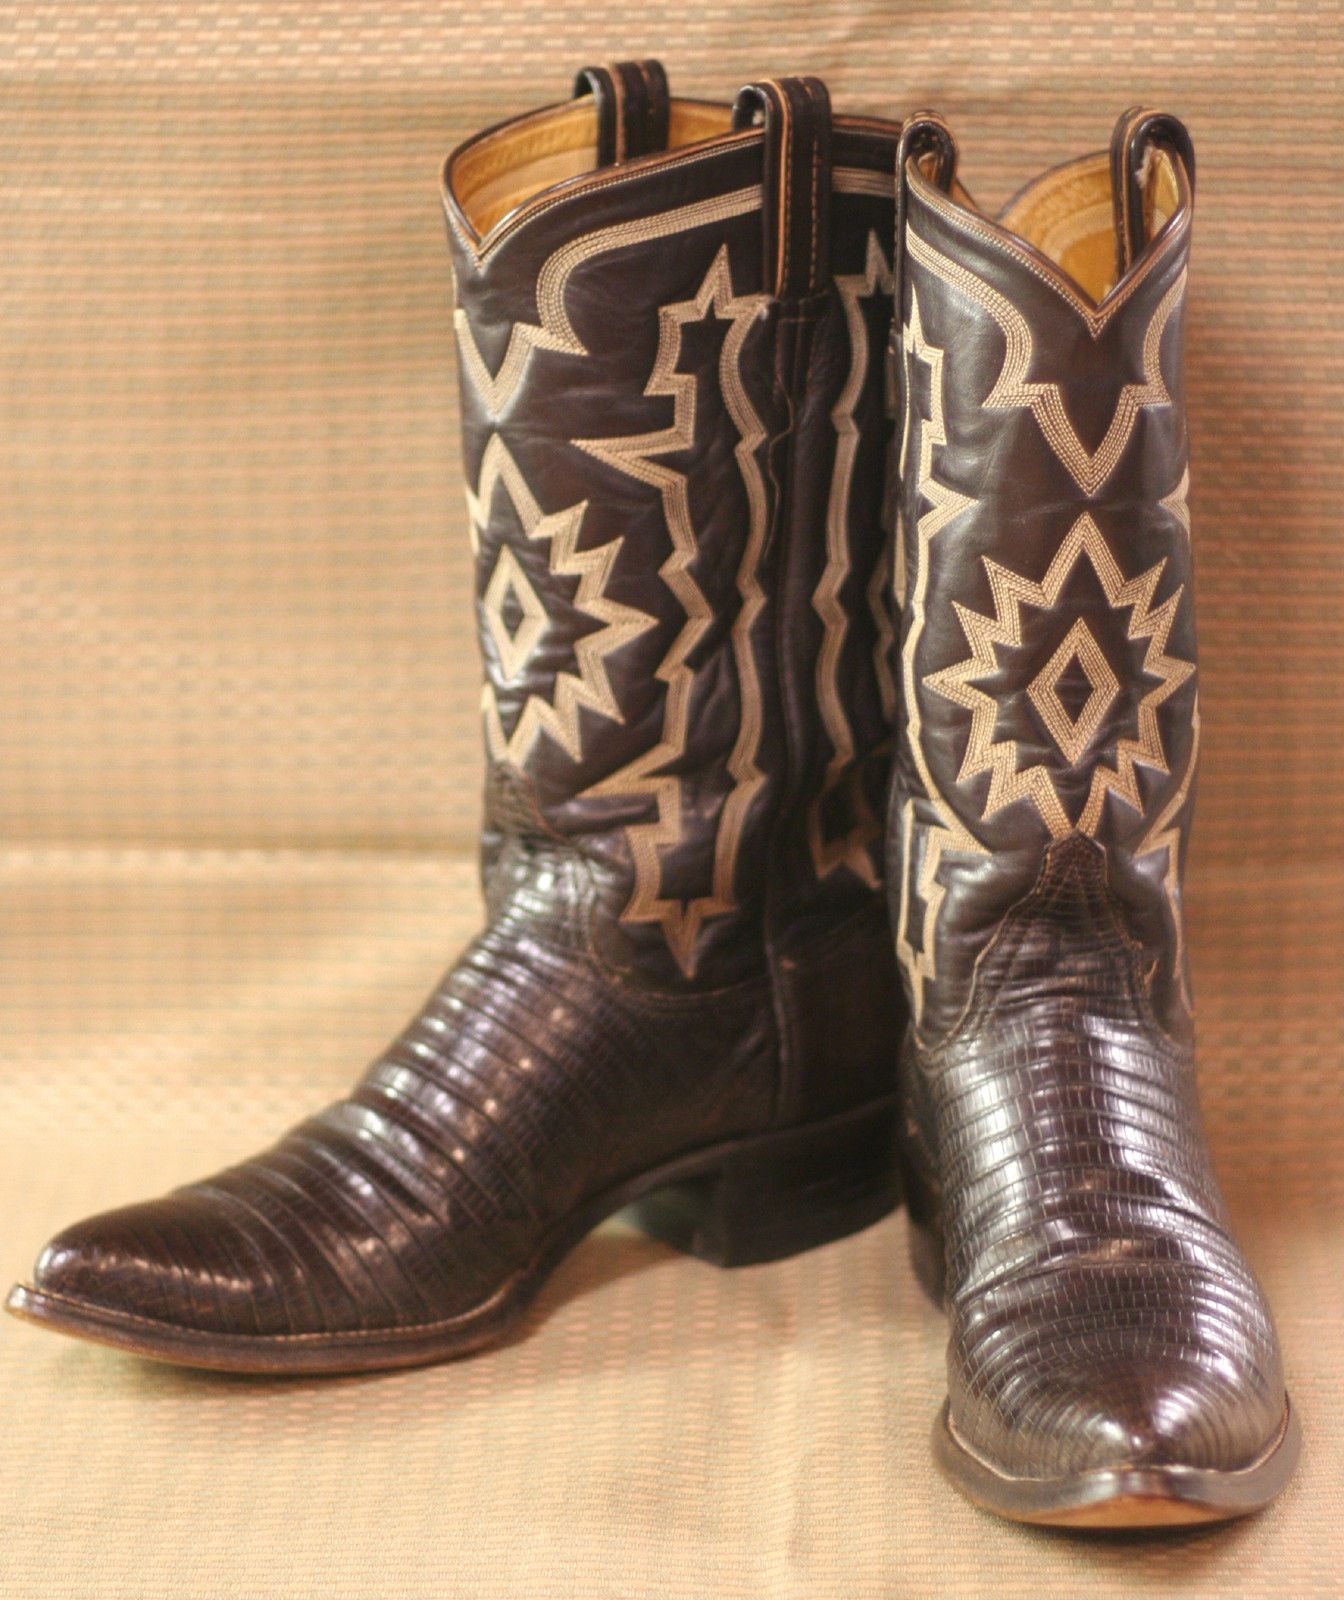 76a653fe9f0 Details about Men's Vintage Tony Lama Cowboy Western Boots Dark ...